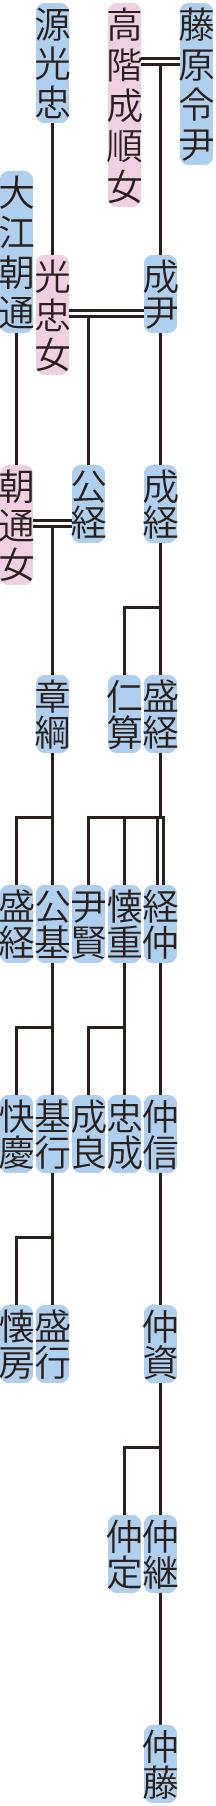 藤原公経・成経の系図